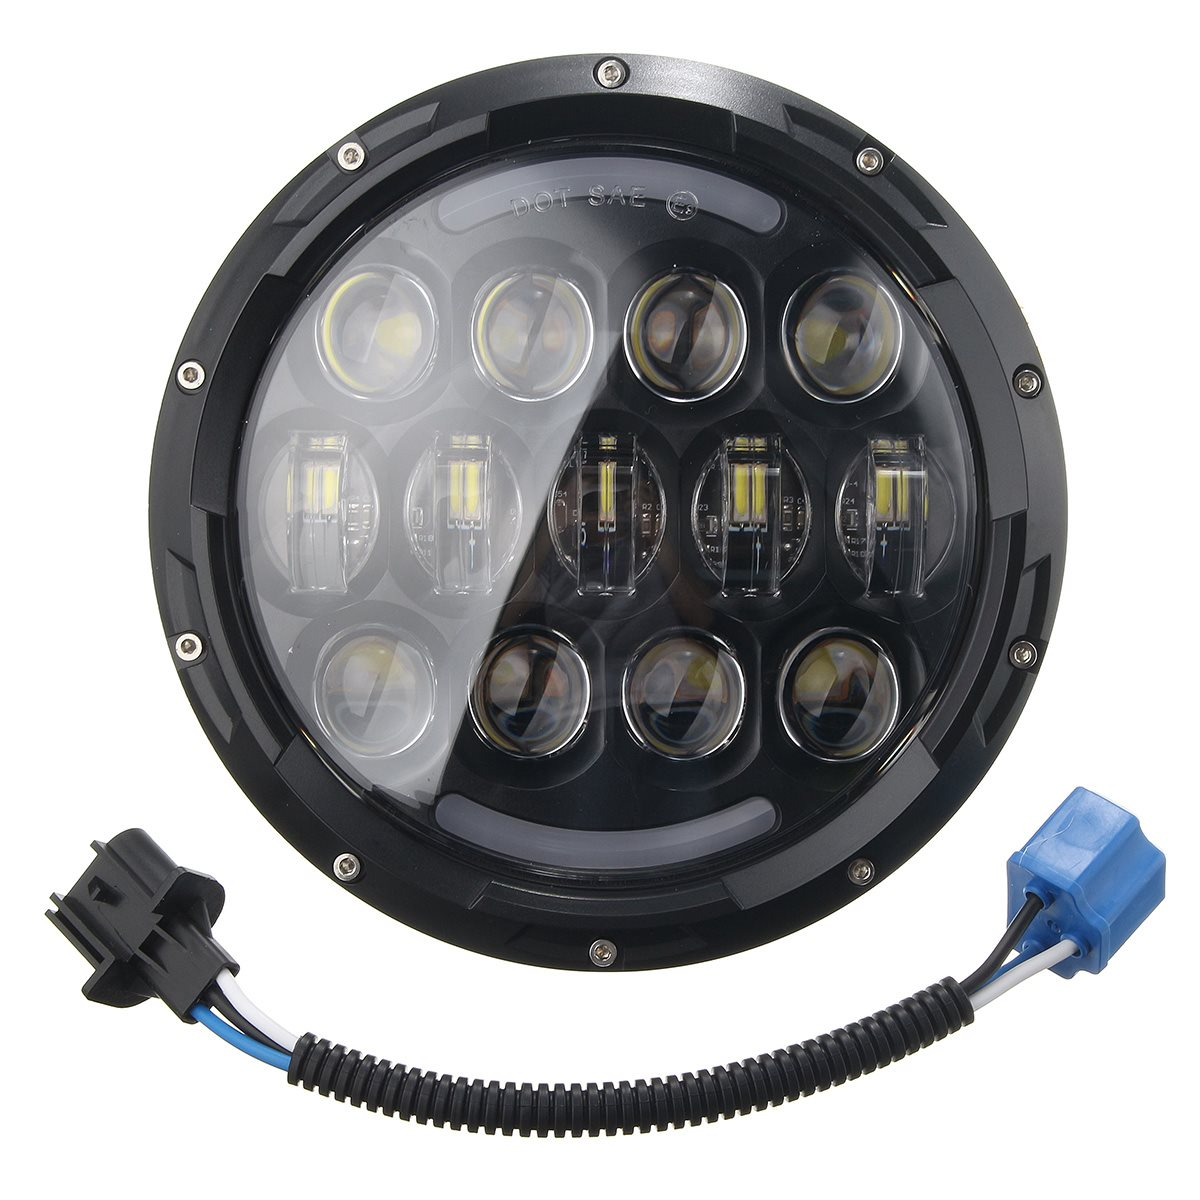 ФОТО 7 Inch 105W Motorcycle LED Headlight Hi/Lo Beam DRL H4 To H13 Plug for Harley-Davidson For Jeep /Wrangler /JK 1997-2016